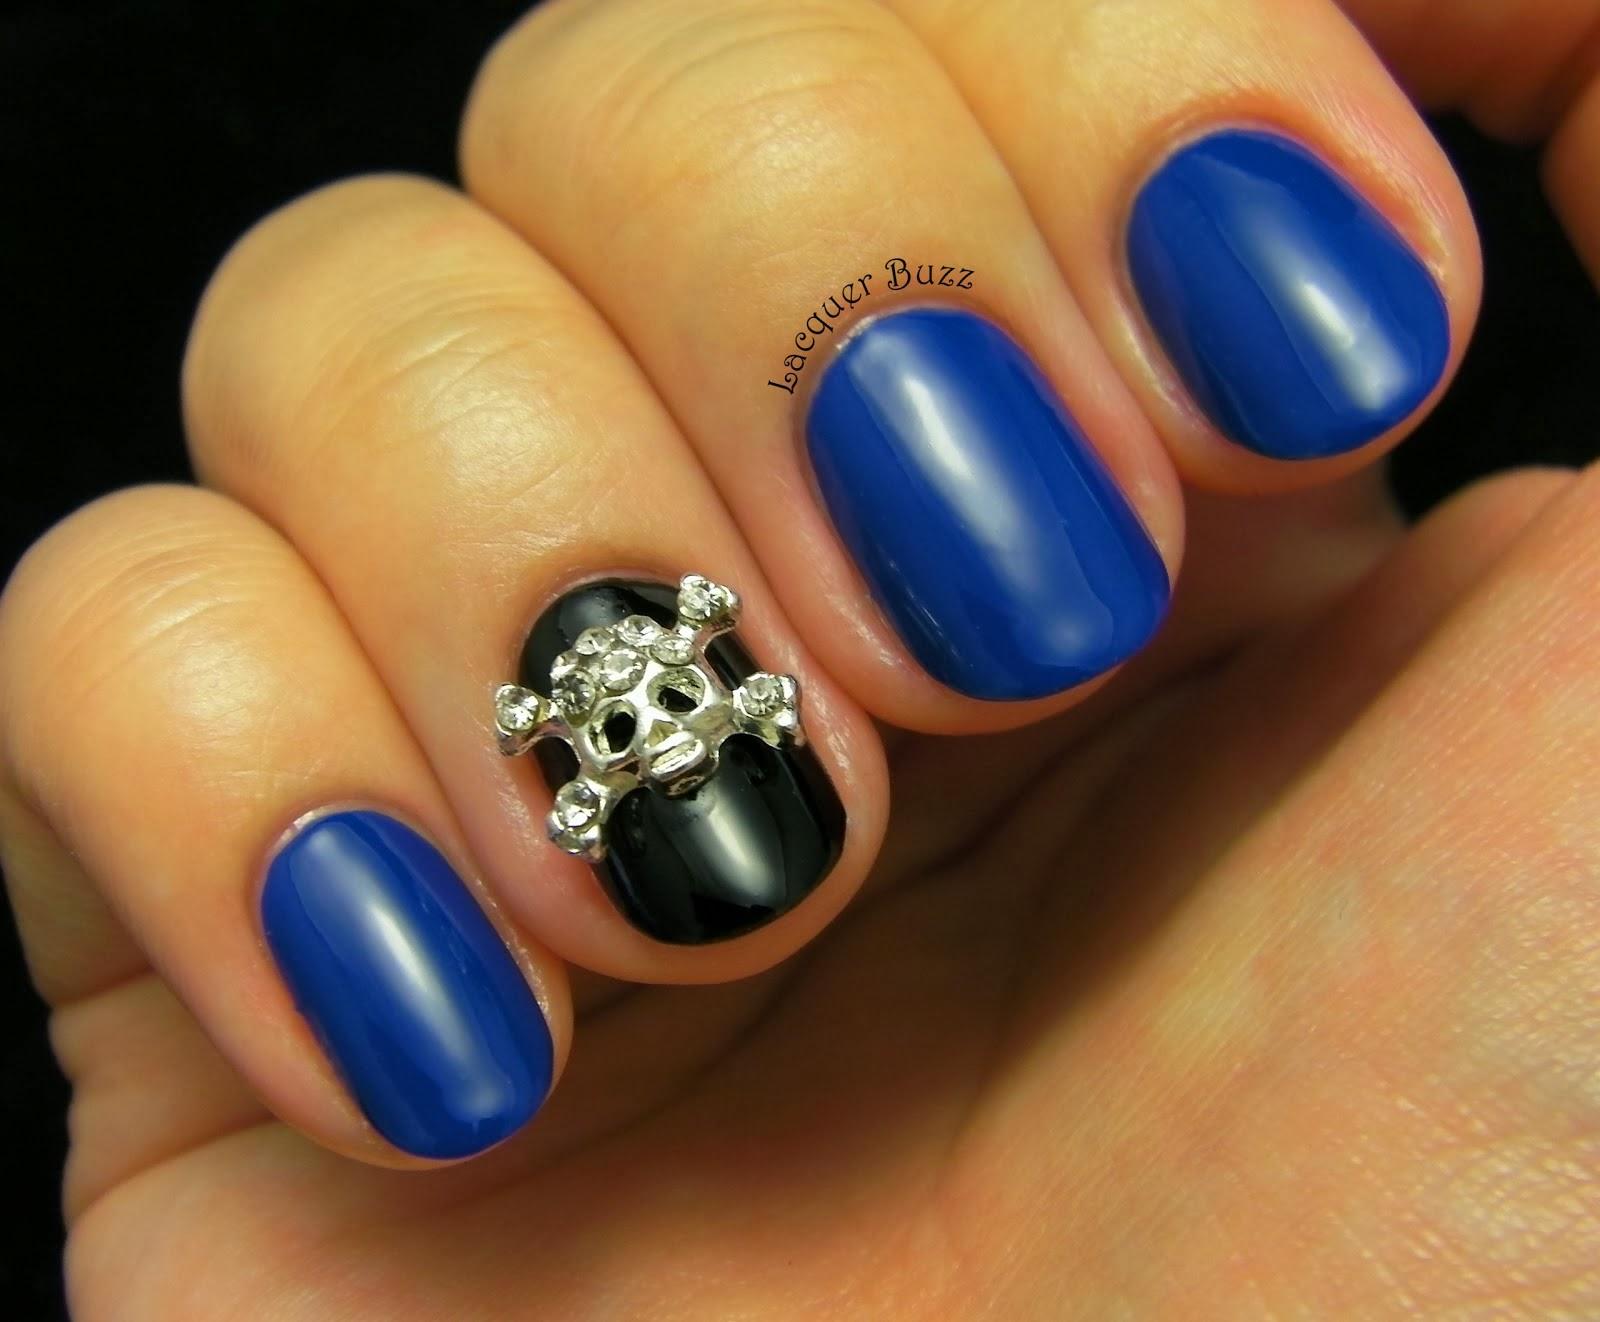 August Amazing Nail Designs Show: Born Pretty Store Blog: Amazing Nail Art Designs Show